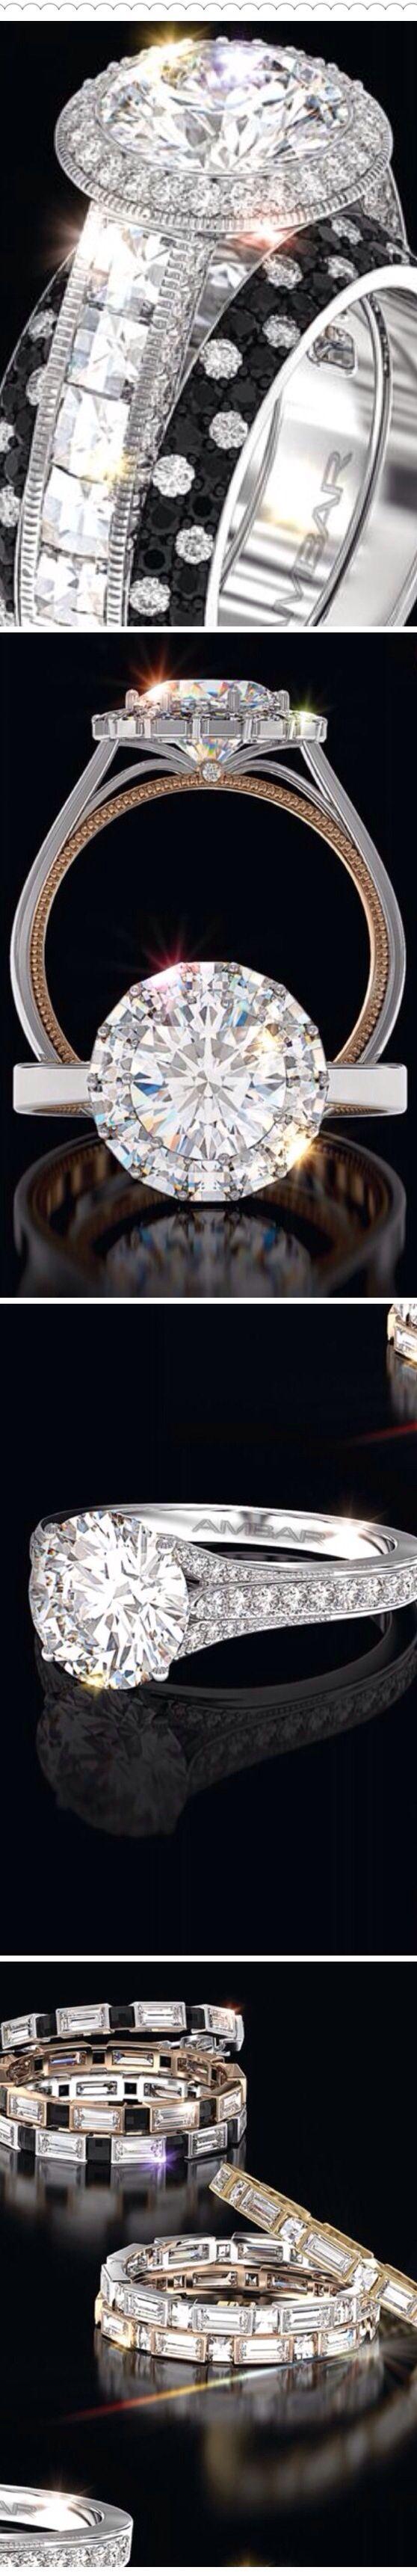 Luxuriously Expensive@Luxurydotcom⭐️